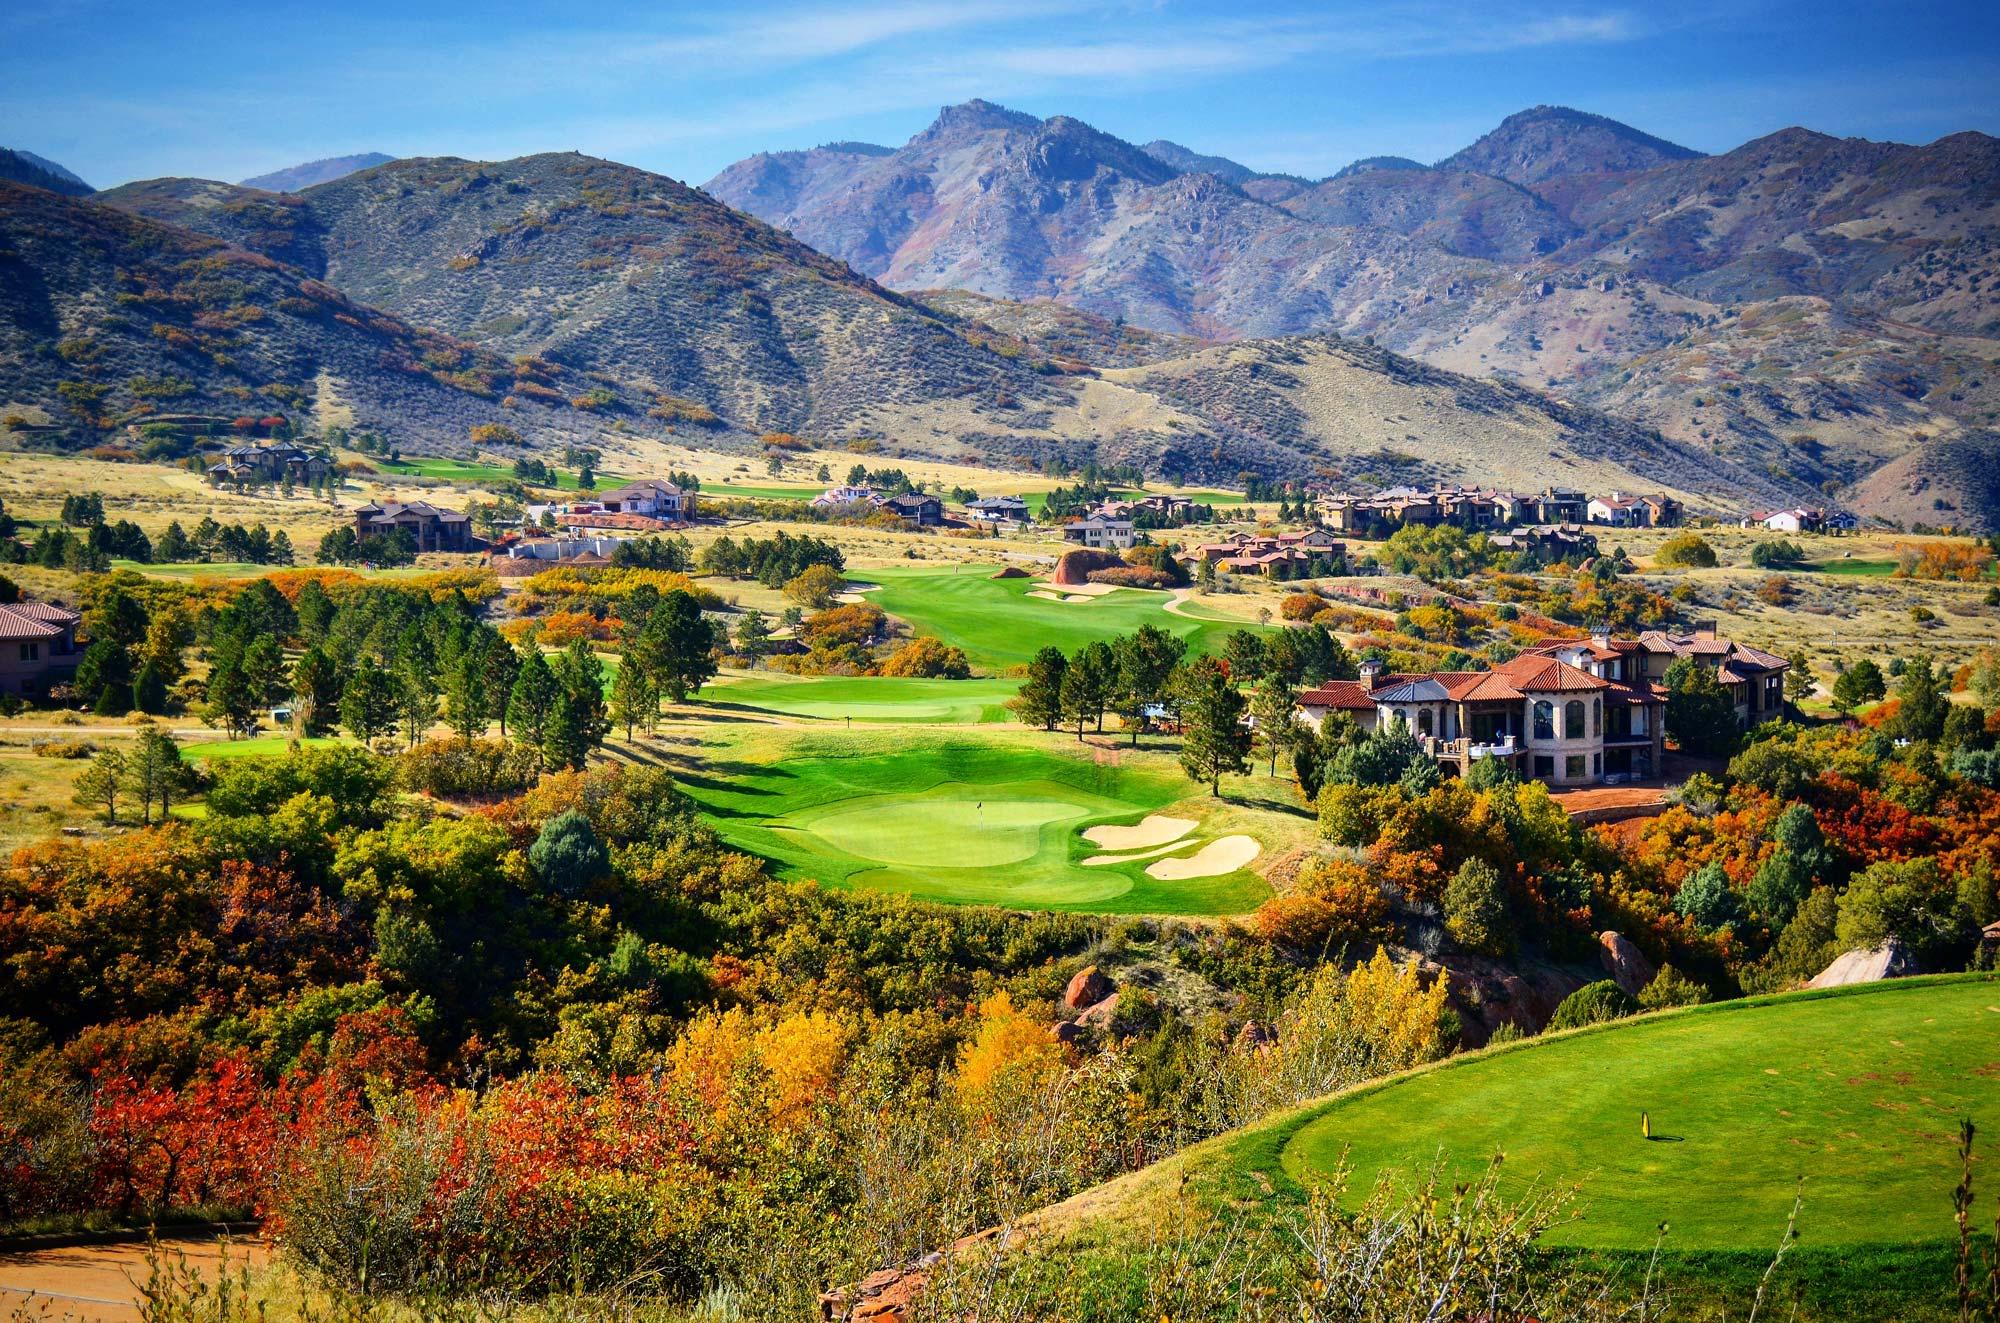 Ravenna Golf, Colorado - Hole #16